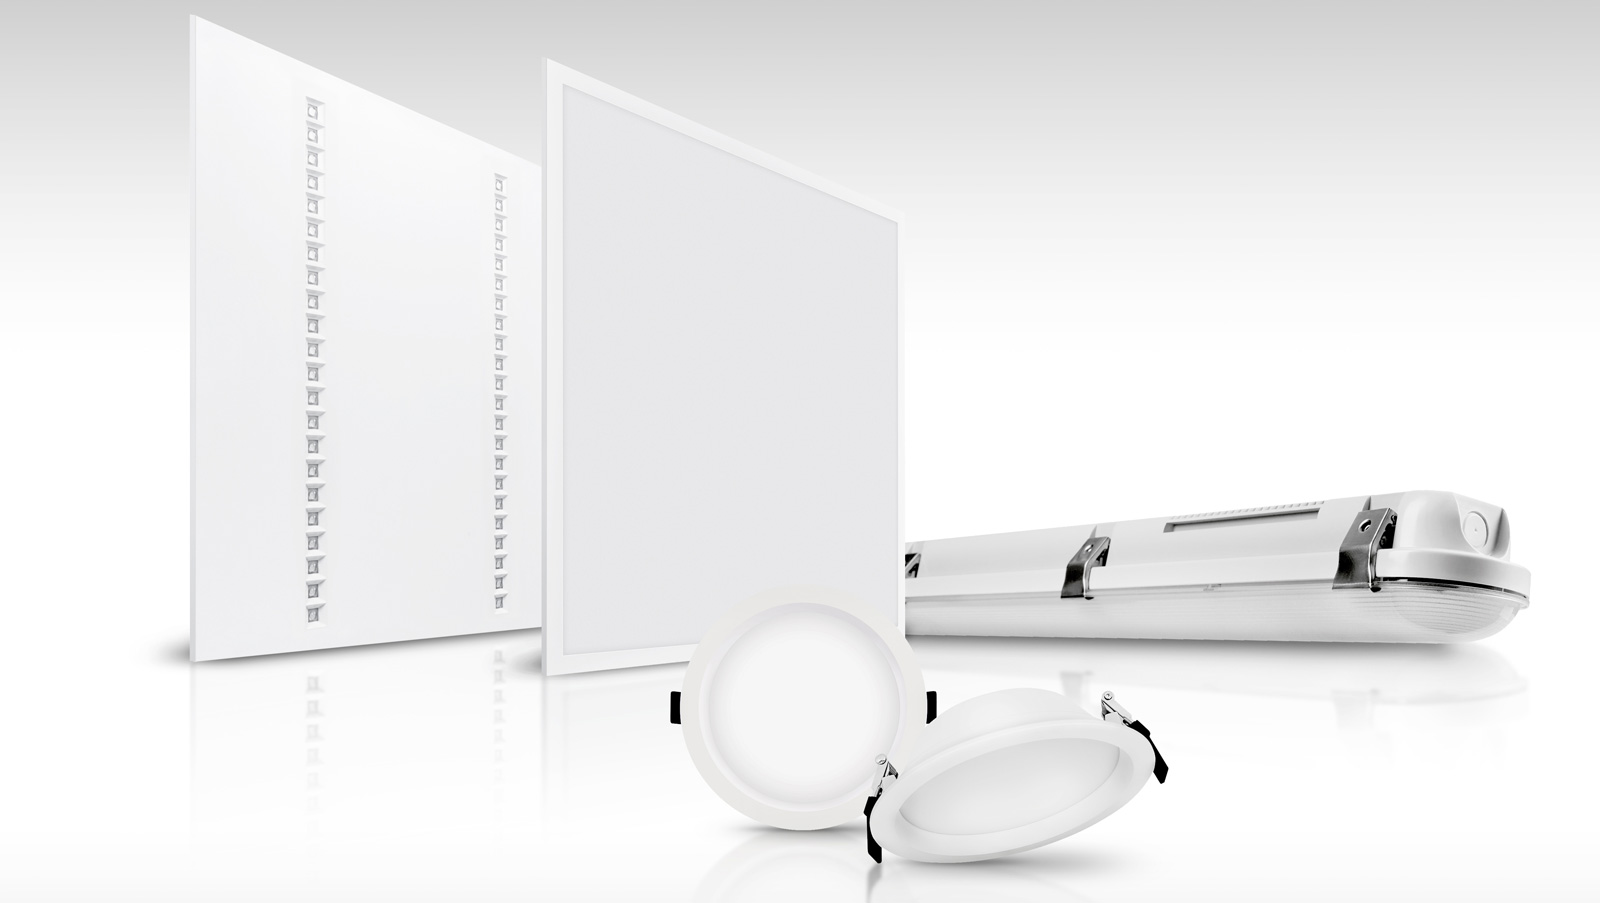 Panel Value, Downlight ALU, Damp Proof - svietidlá s integrovanou funkciou núdzového osvetlenia